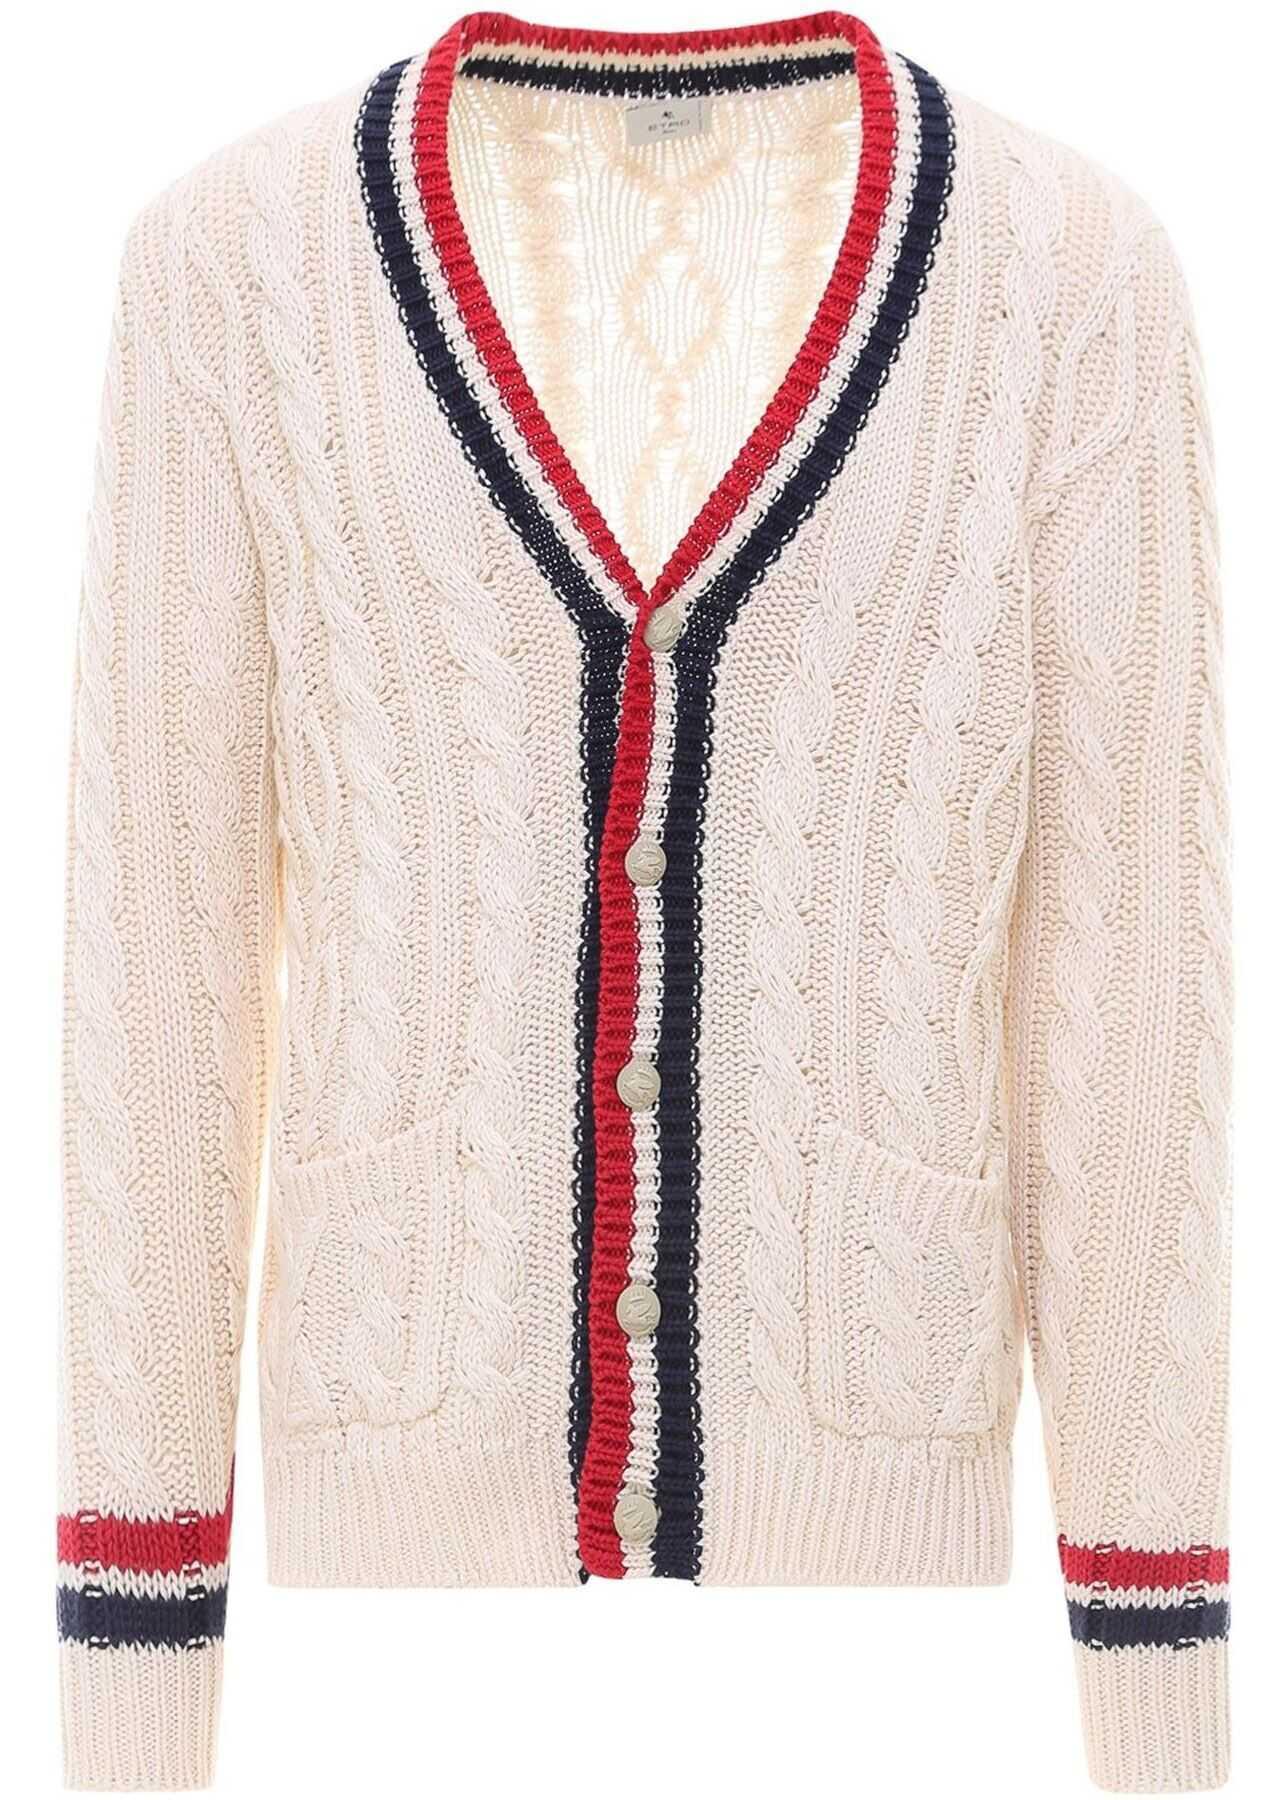 ETRO Cable Knit Cotton Cardigan In Beige Beige imagine